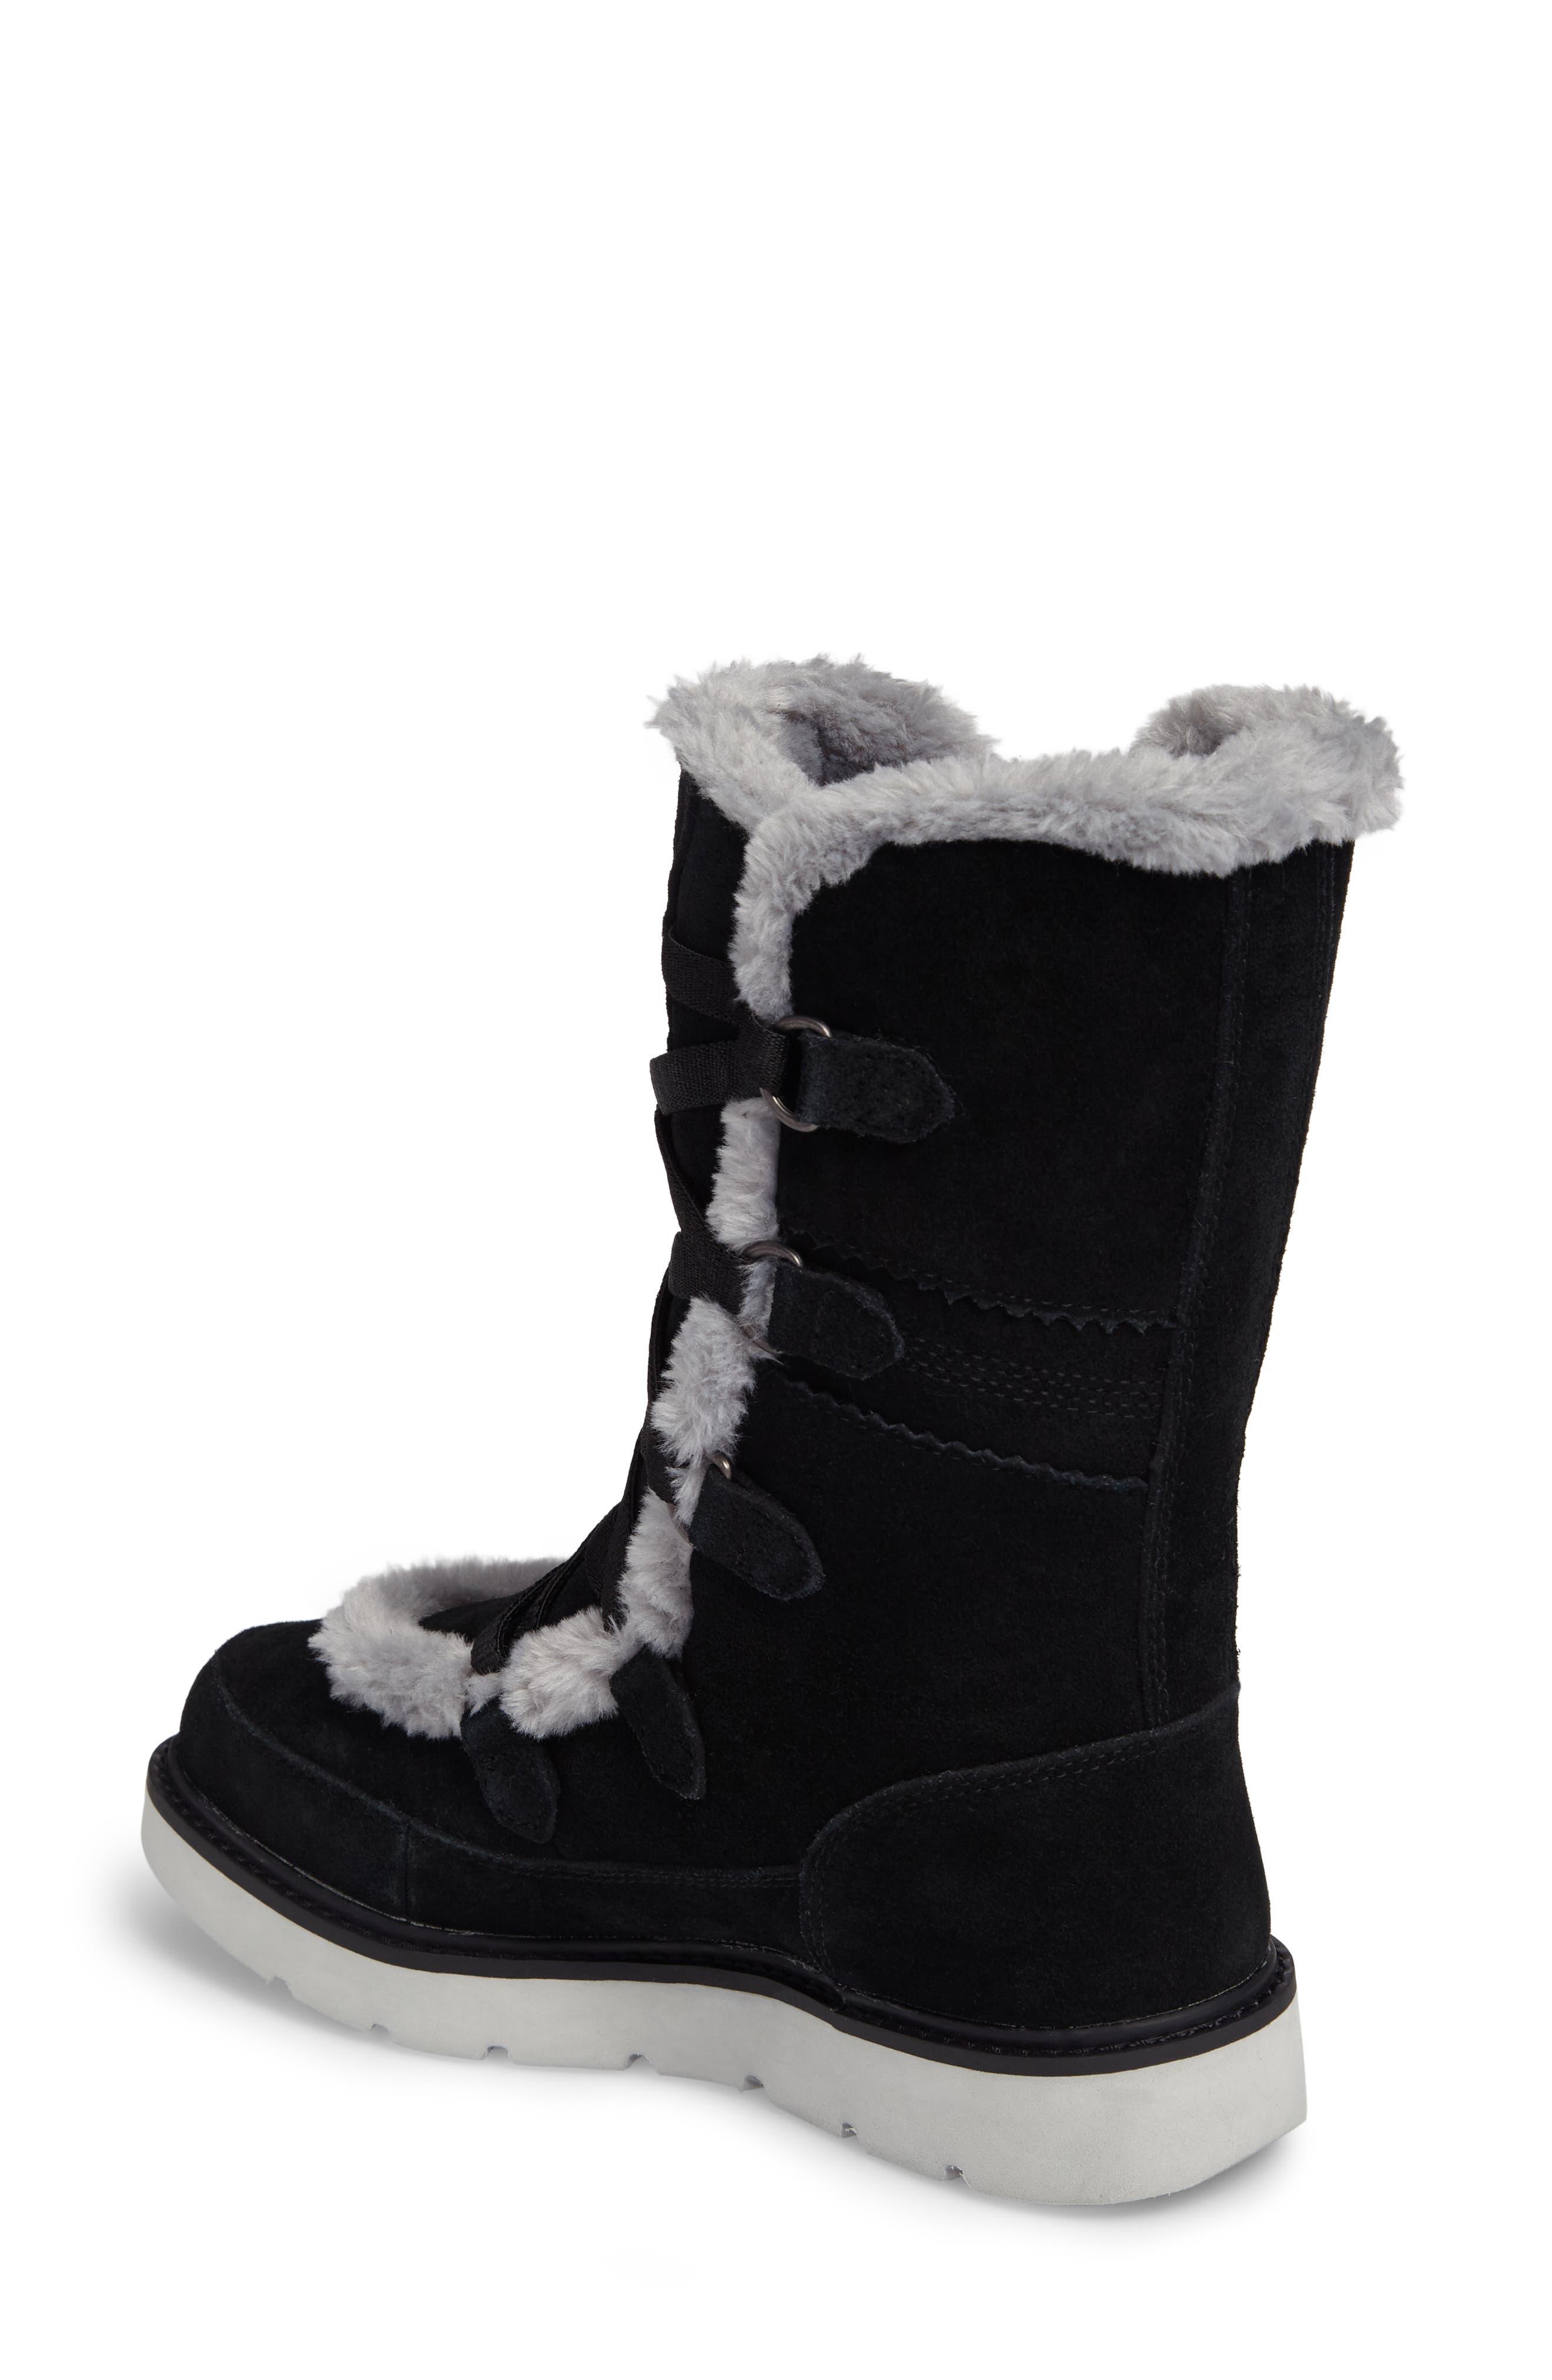 Kenniston Faux Fur Water Resistant Mukluk Boot,                             Alternate thumbnail 2, color,                             001